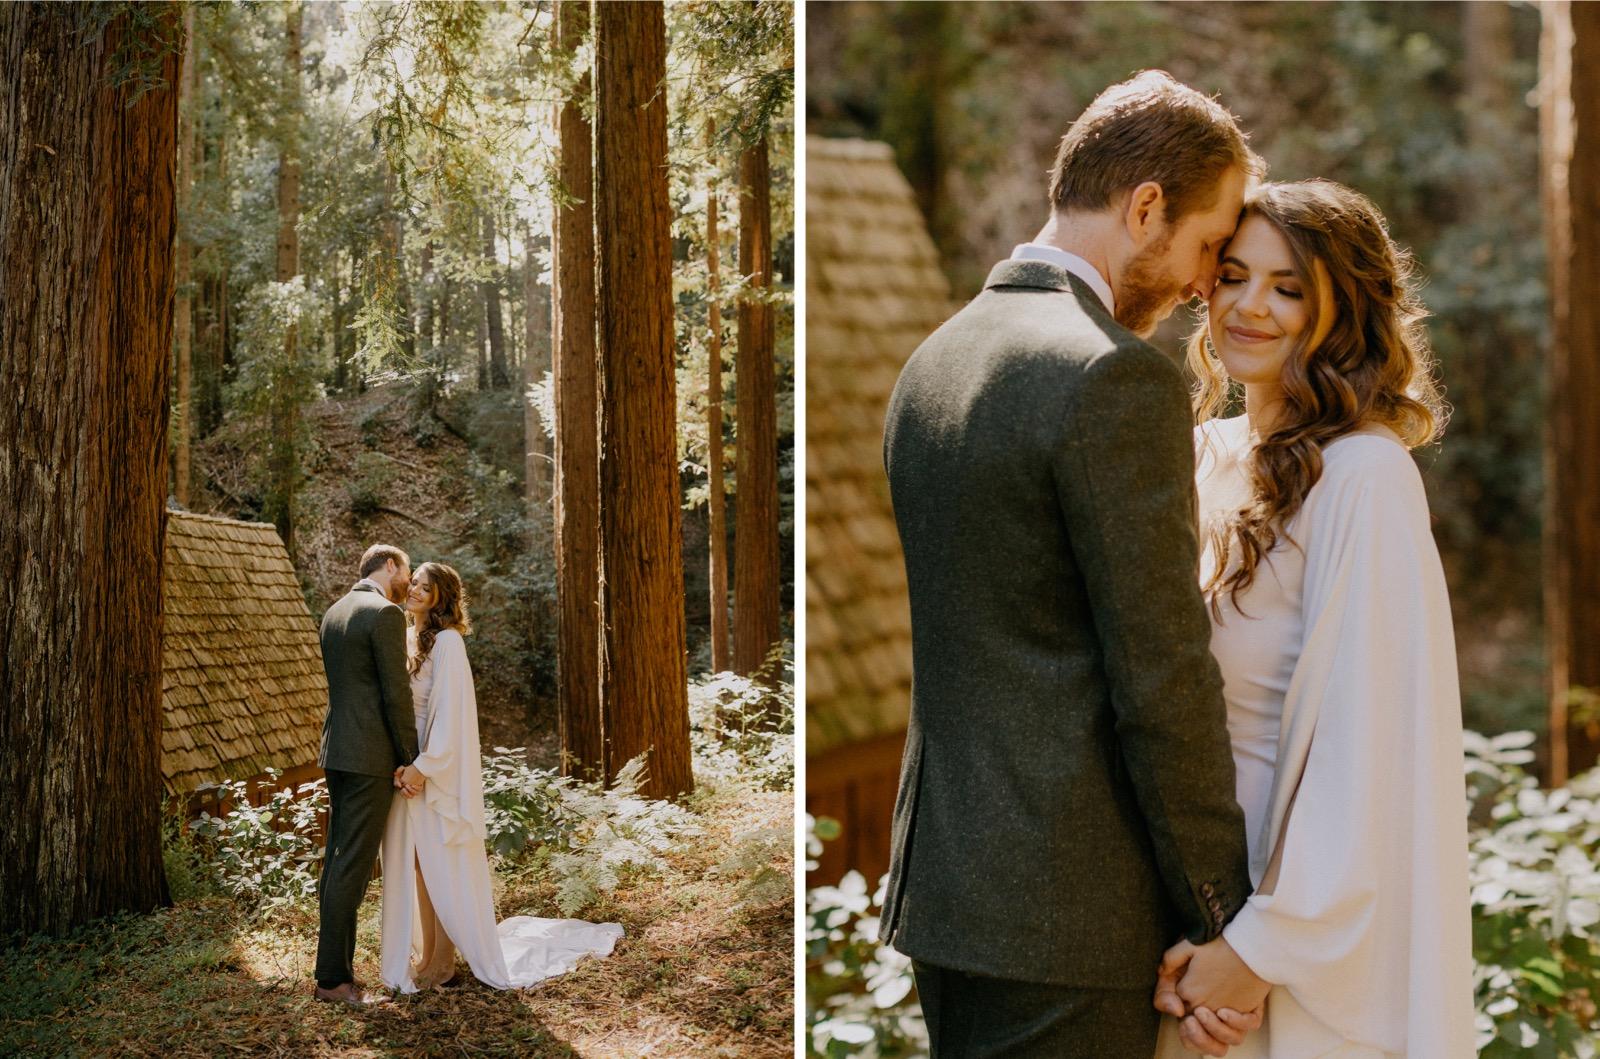 033_Emily & Jeff Wedding 0238_Emily & Jeff Wedding 0237_portrait_outdoor_forest_ben-lomond_wedding_intimate